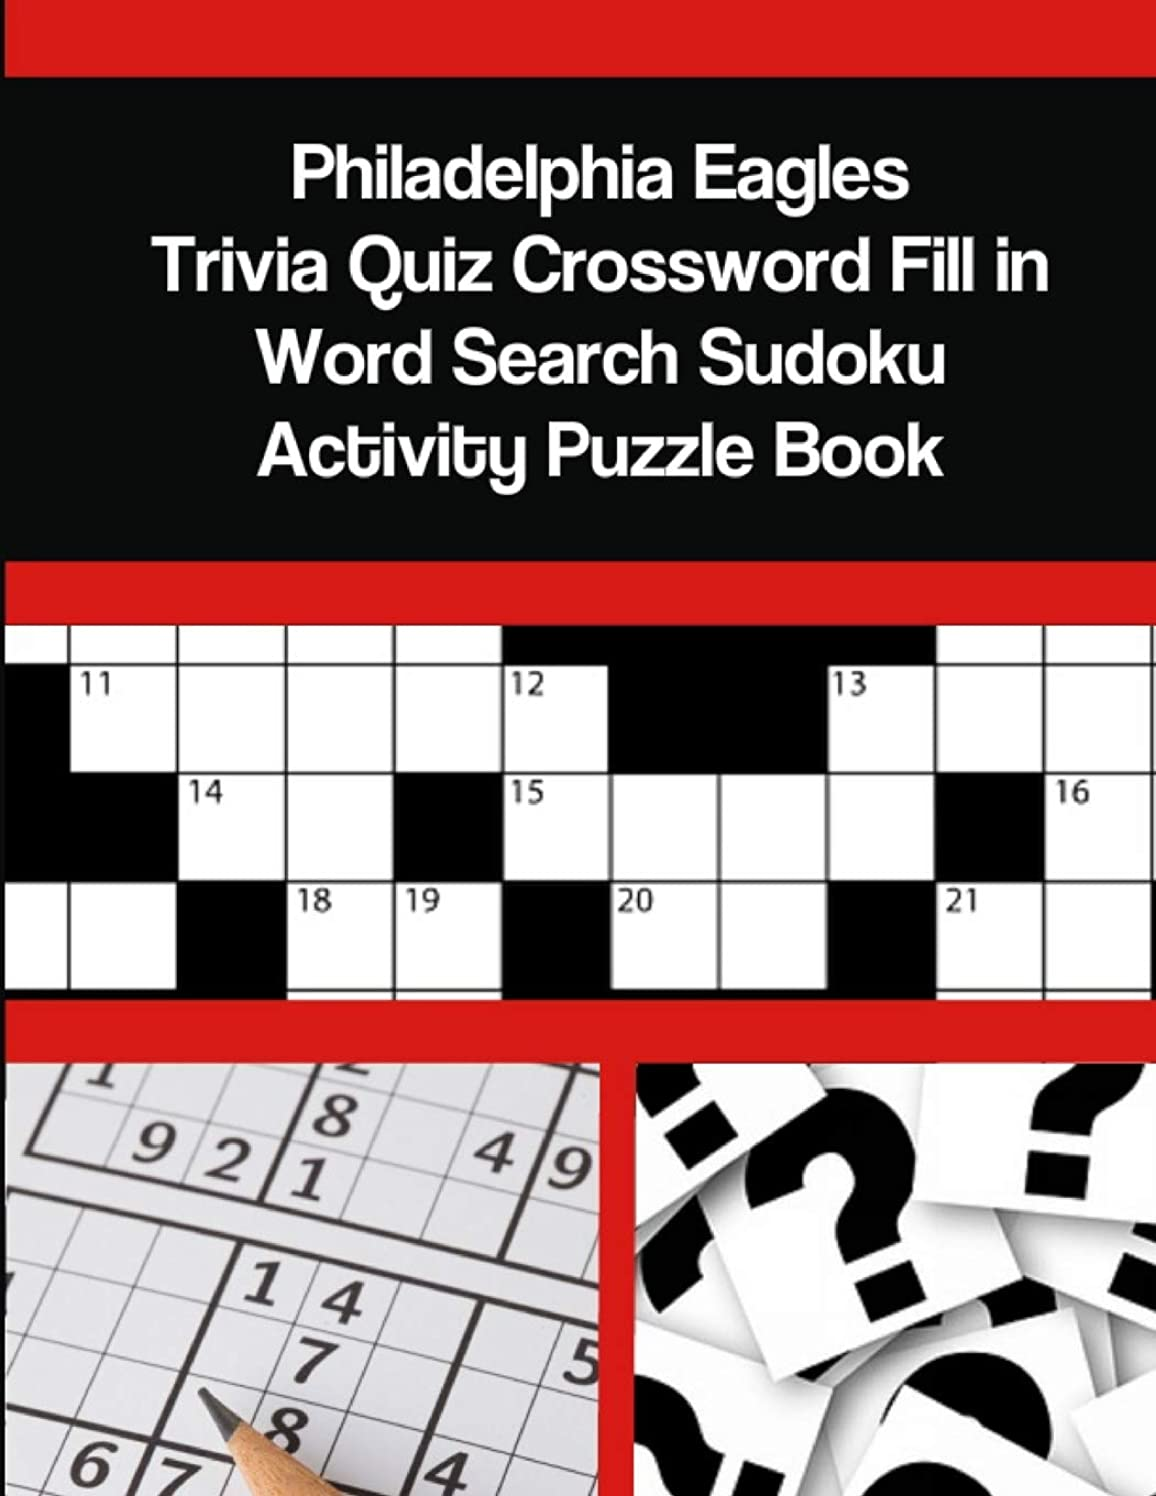 Philadelphia Eagles Trivia Quiz Crossword Fill in Word Search Sudoku Activity Puzzle Book